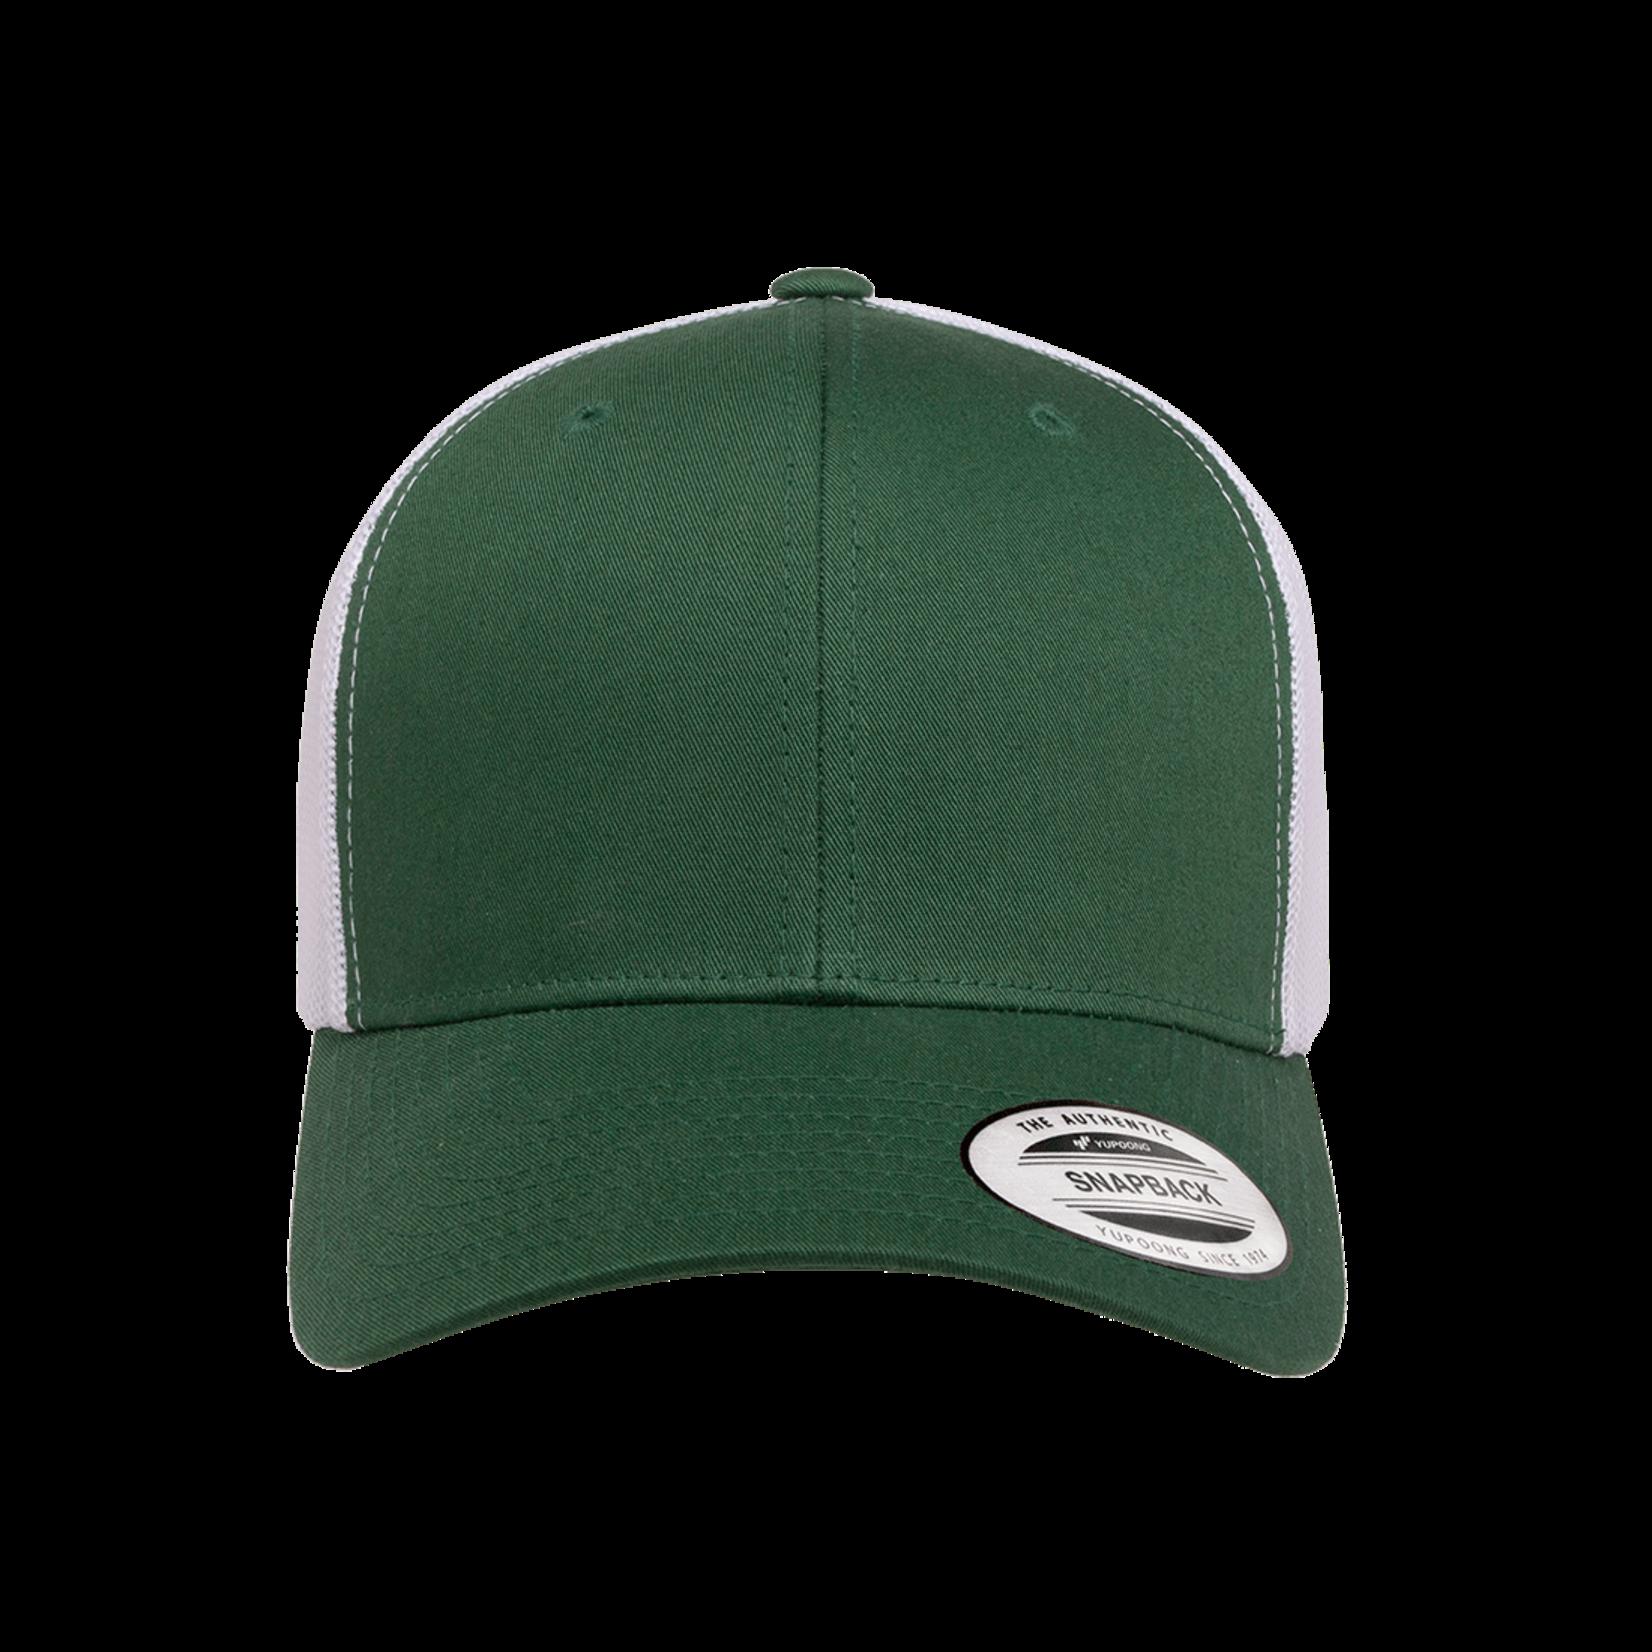 Flexfit Flexfit 6606T 2-Tone Snapback Trucker Hat - Evergreen/White